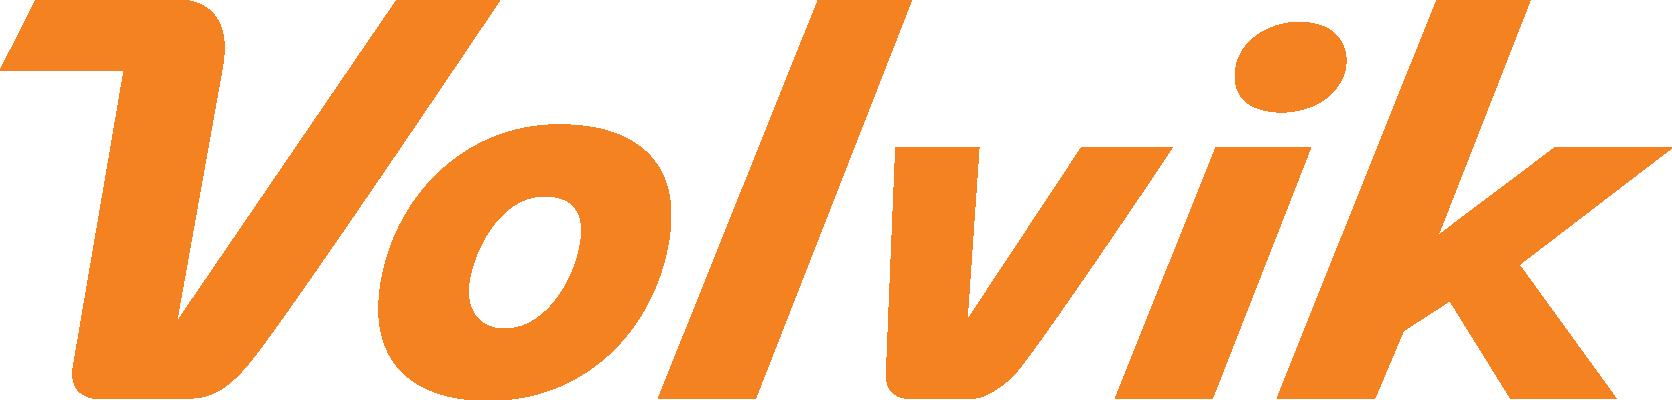 Volvik157